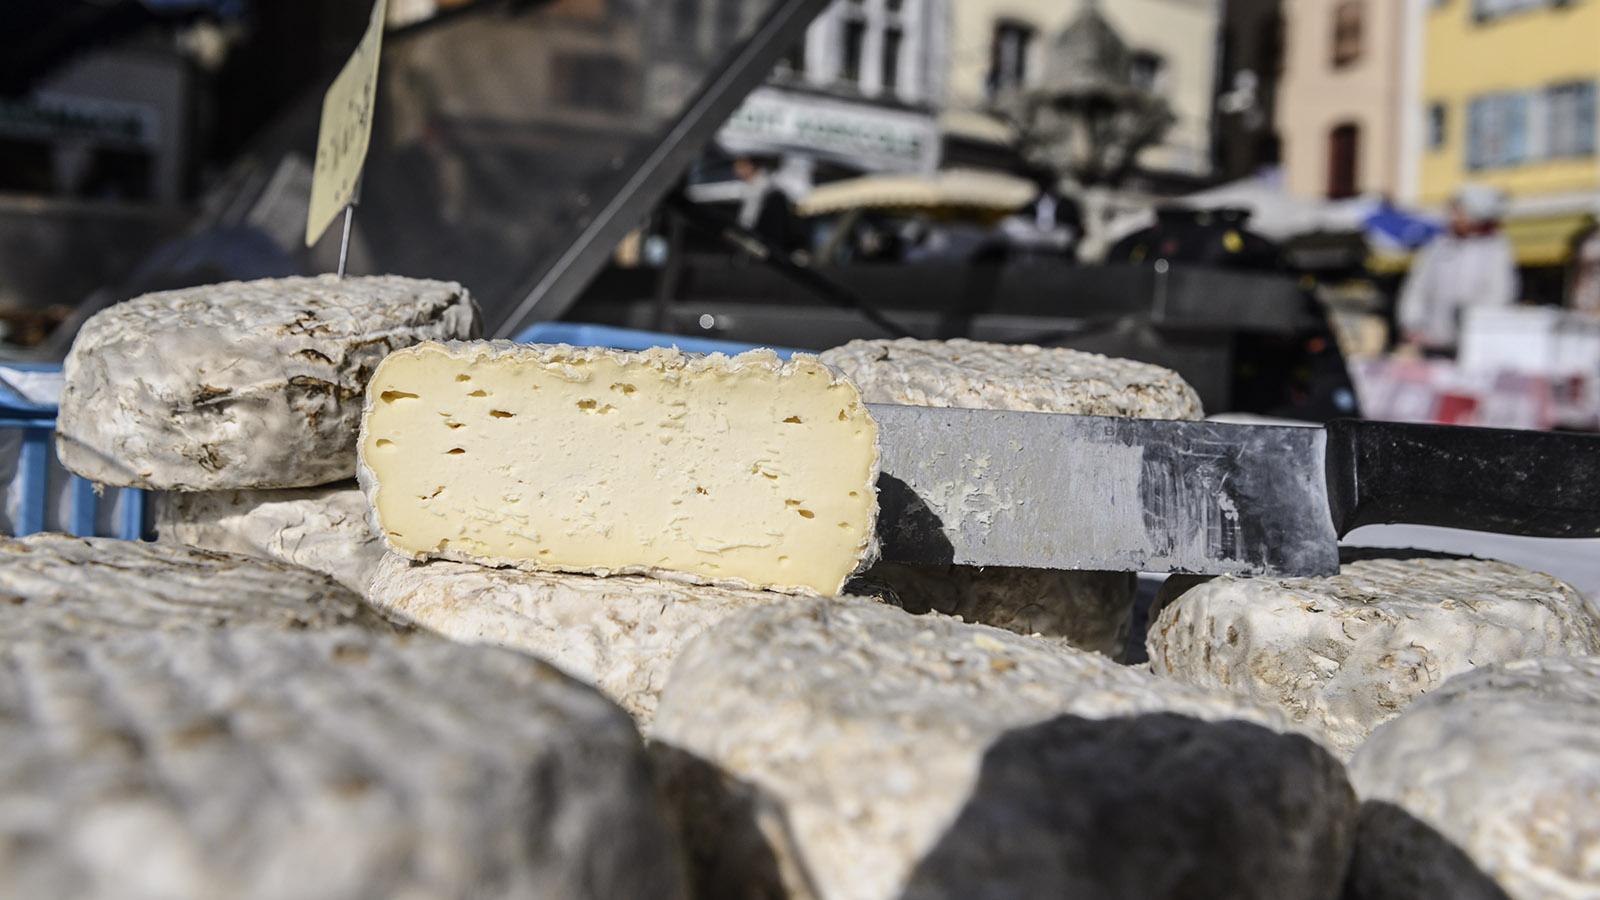 Le Velay, der lokale Käse aus Le Puy-en-Velay. Foto: Hilke Maunder